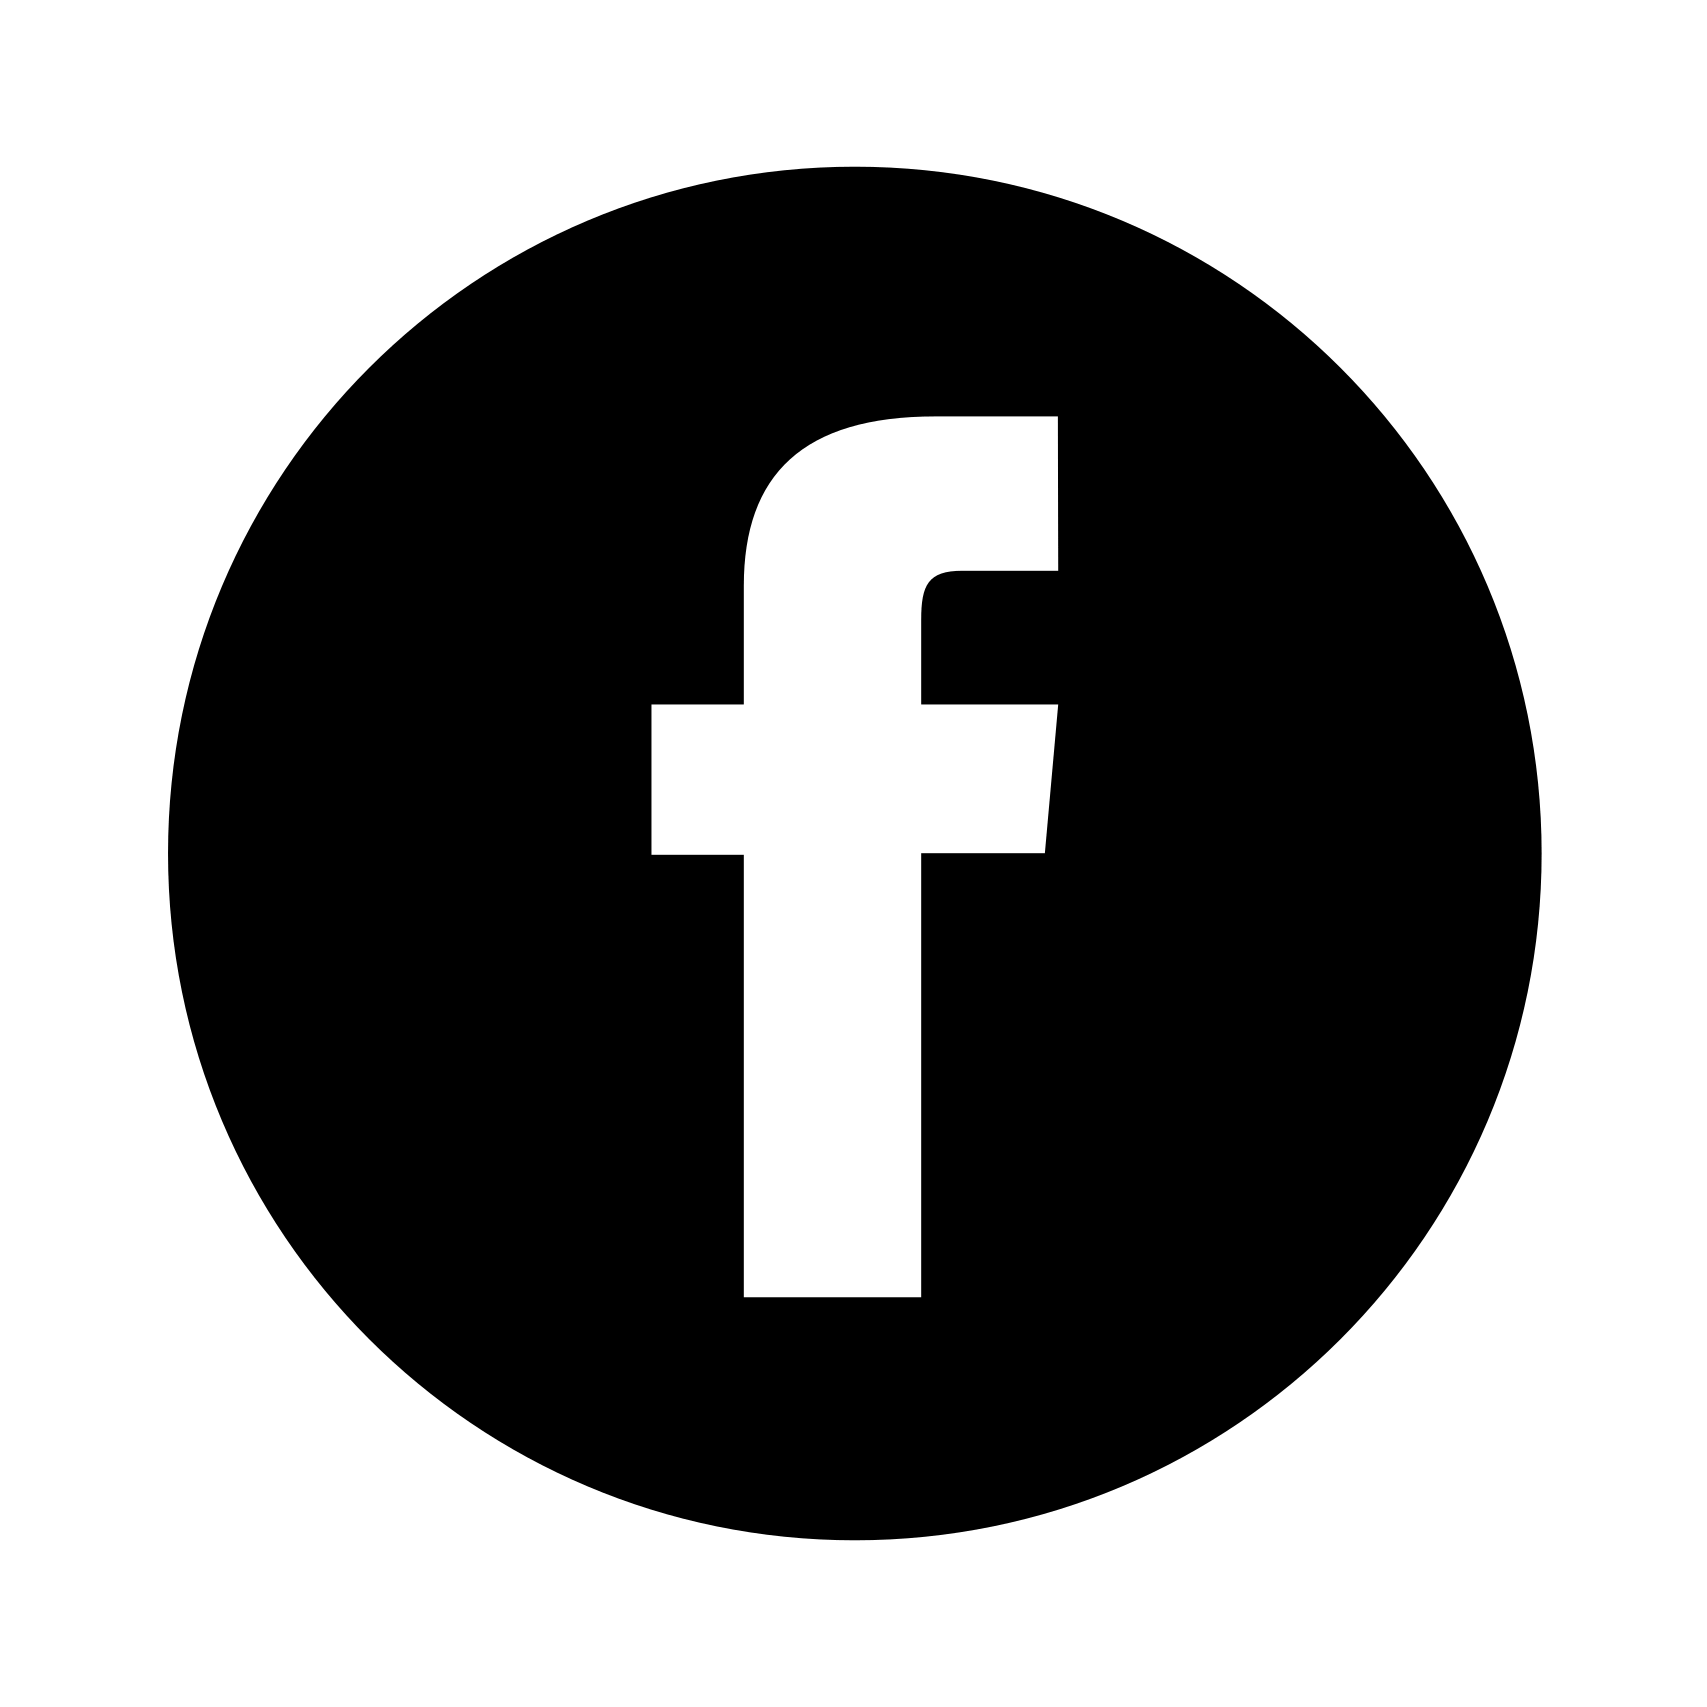 Facebook clipart transparent.  best logo icons